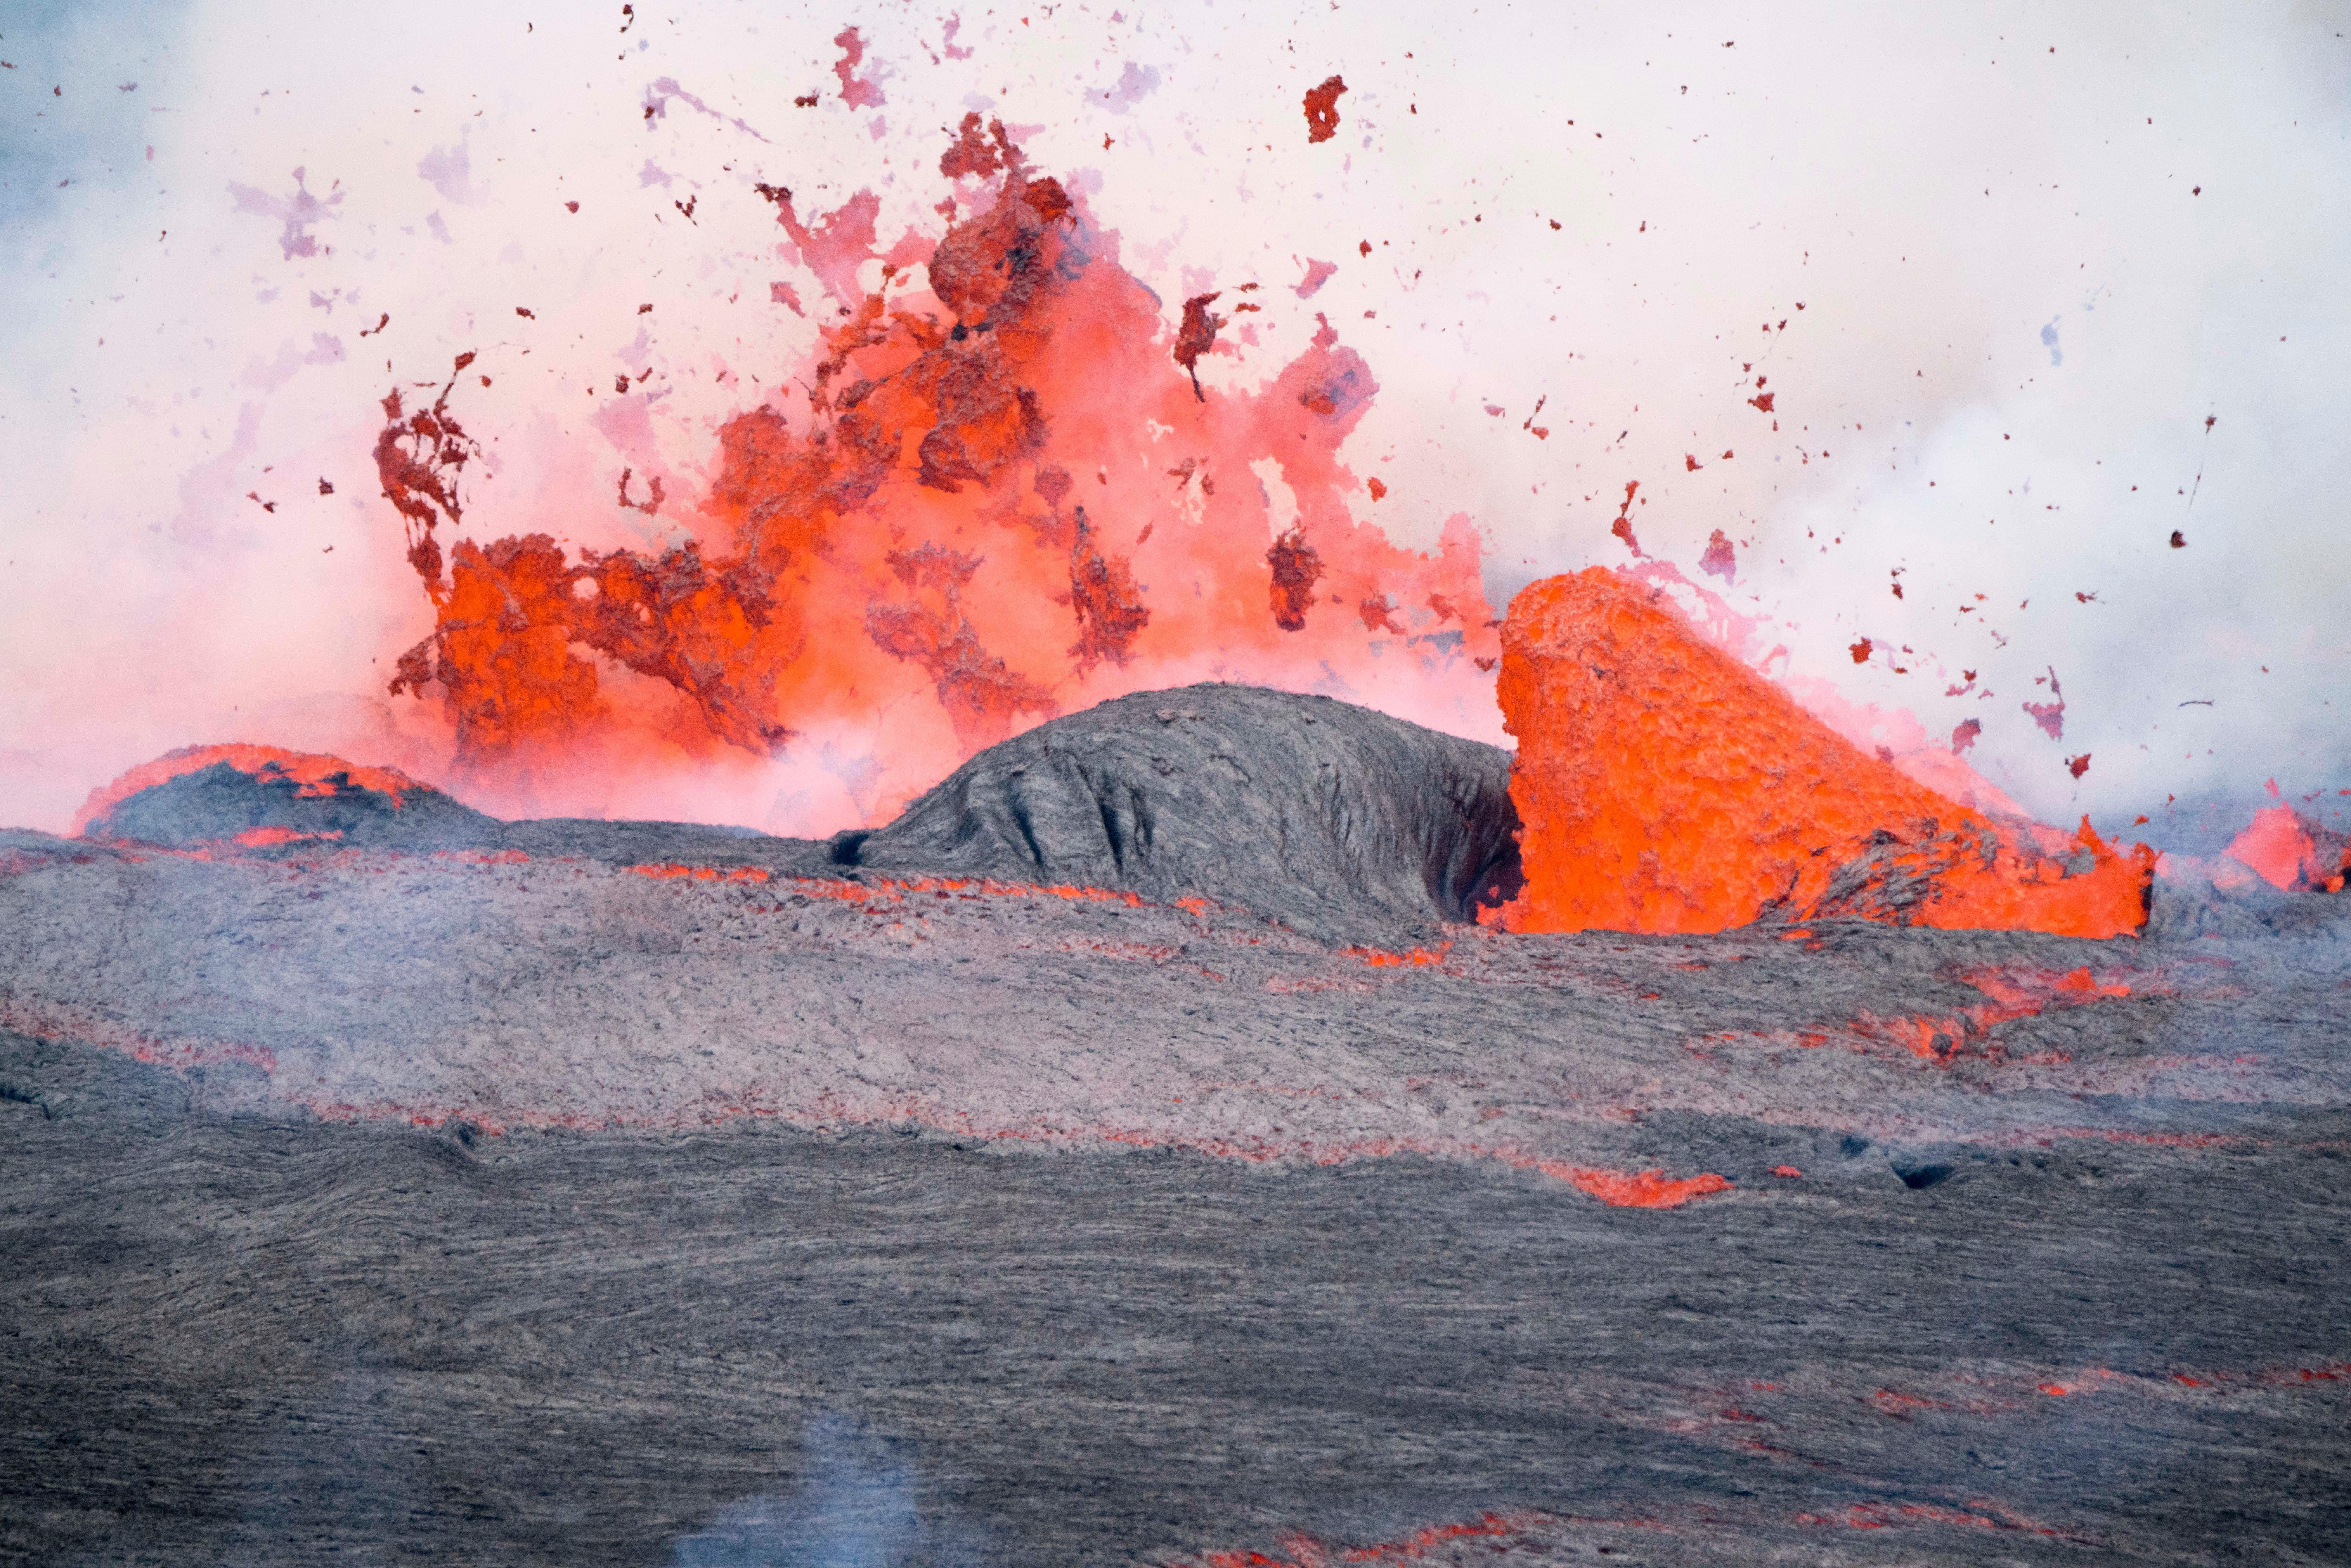 Lava splashing against a rock surface.